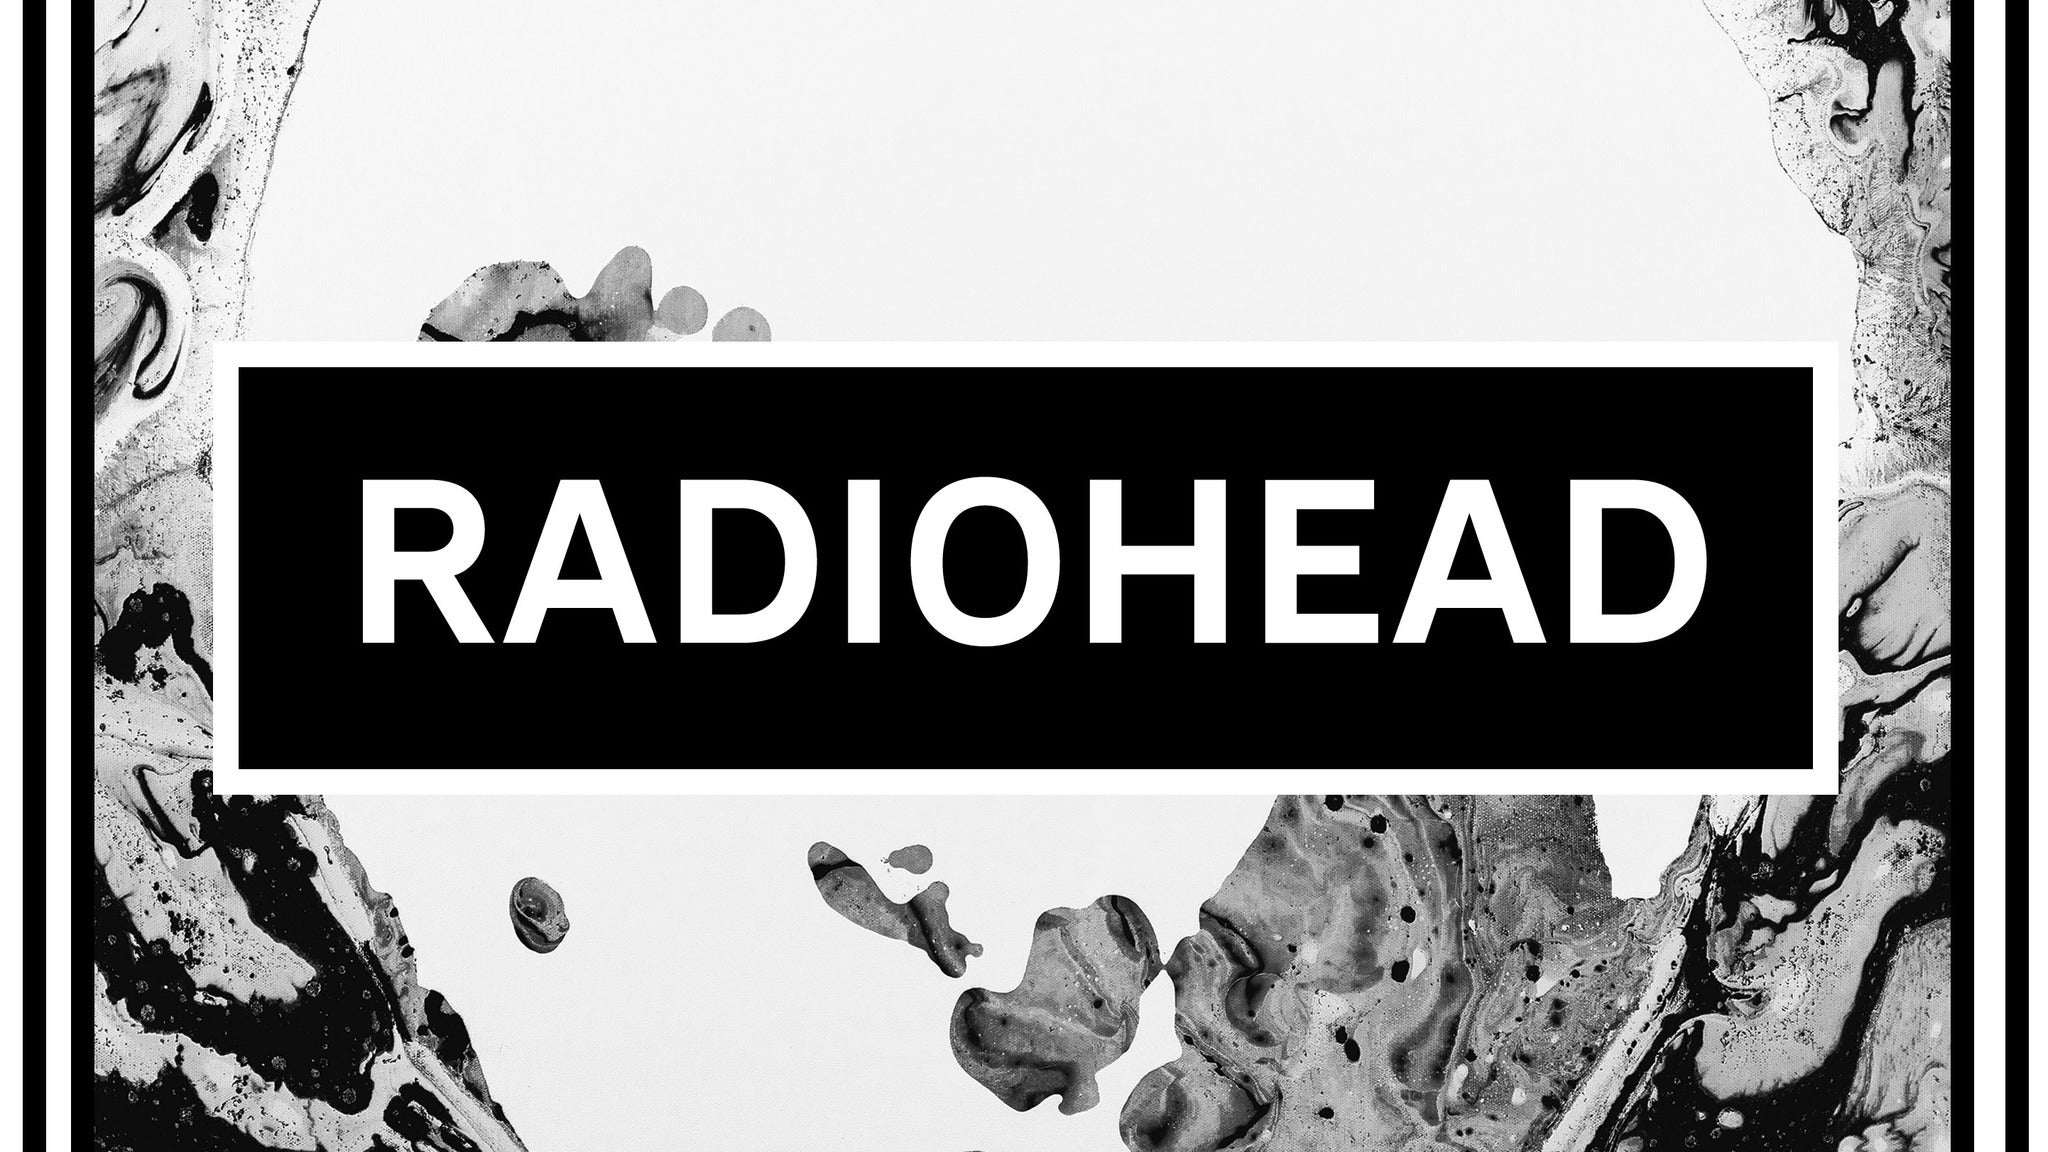 Radiohead at Philips Arena